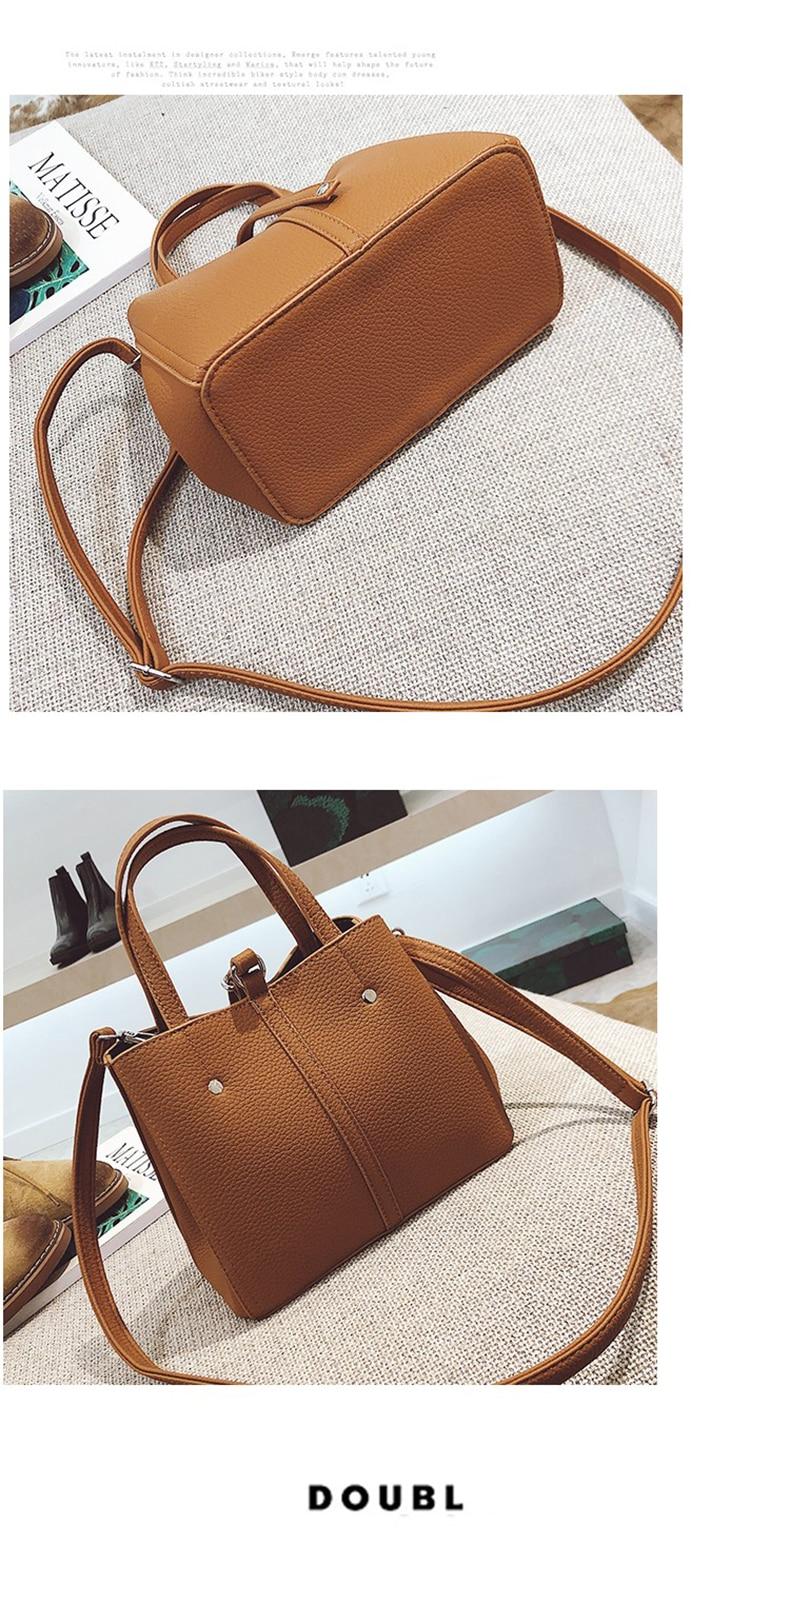 2017 New Lock Buckle Top-Handbag Women Fashion Single Shoulder Bag High Quality PU Leather Ladies Bucket Casual Tote Bag